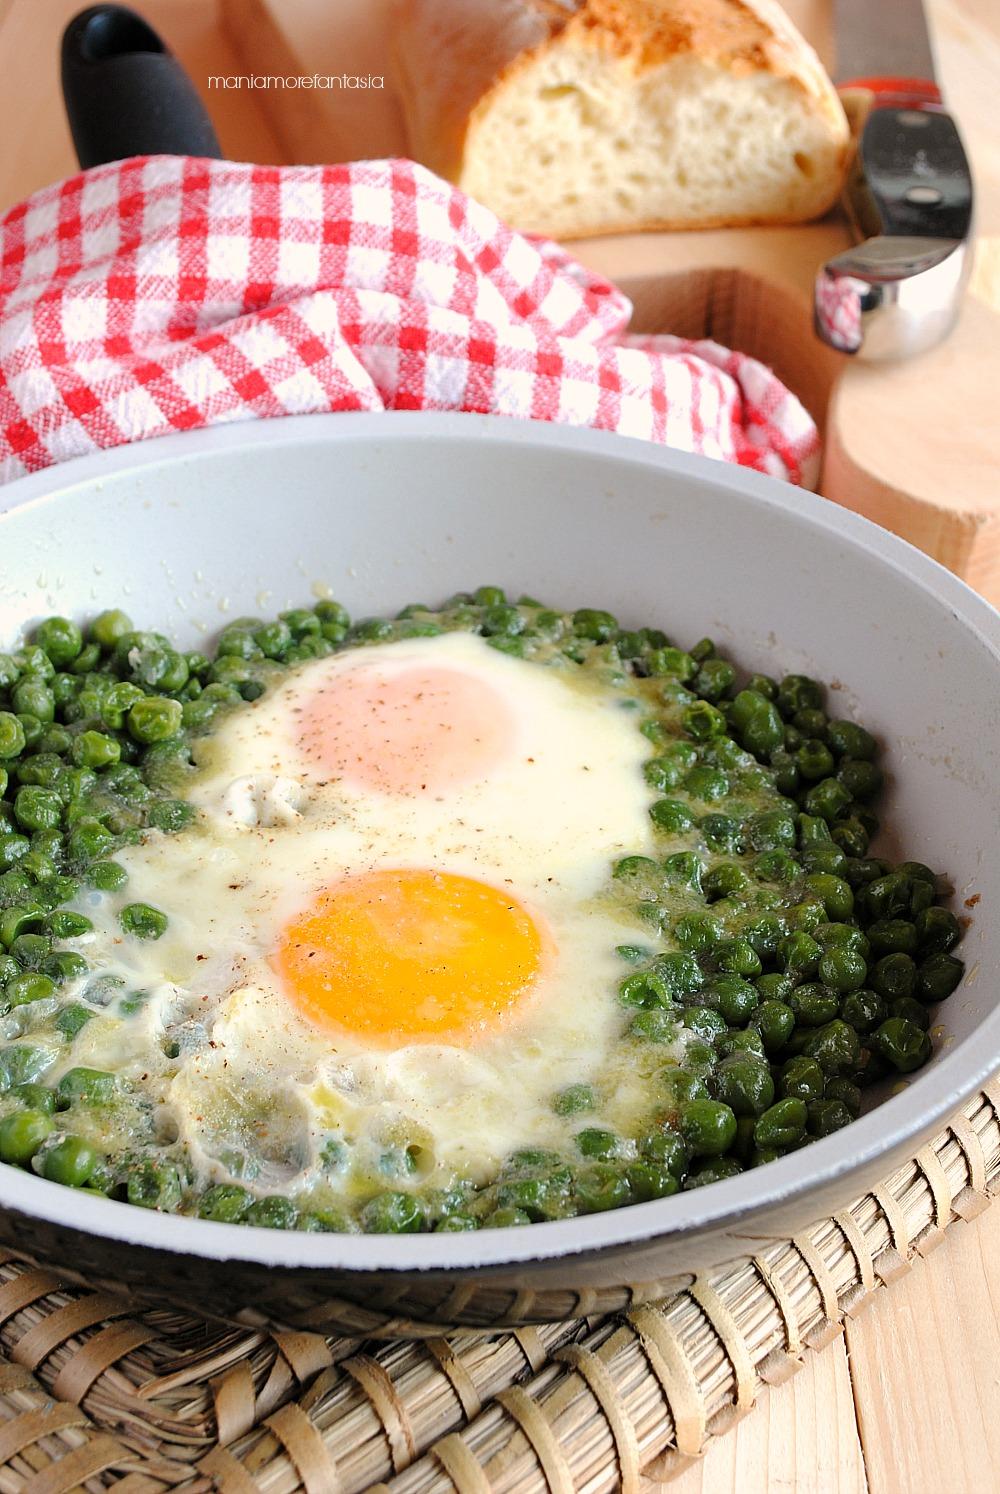 uova con piselli surgelati